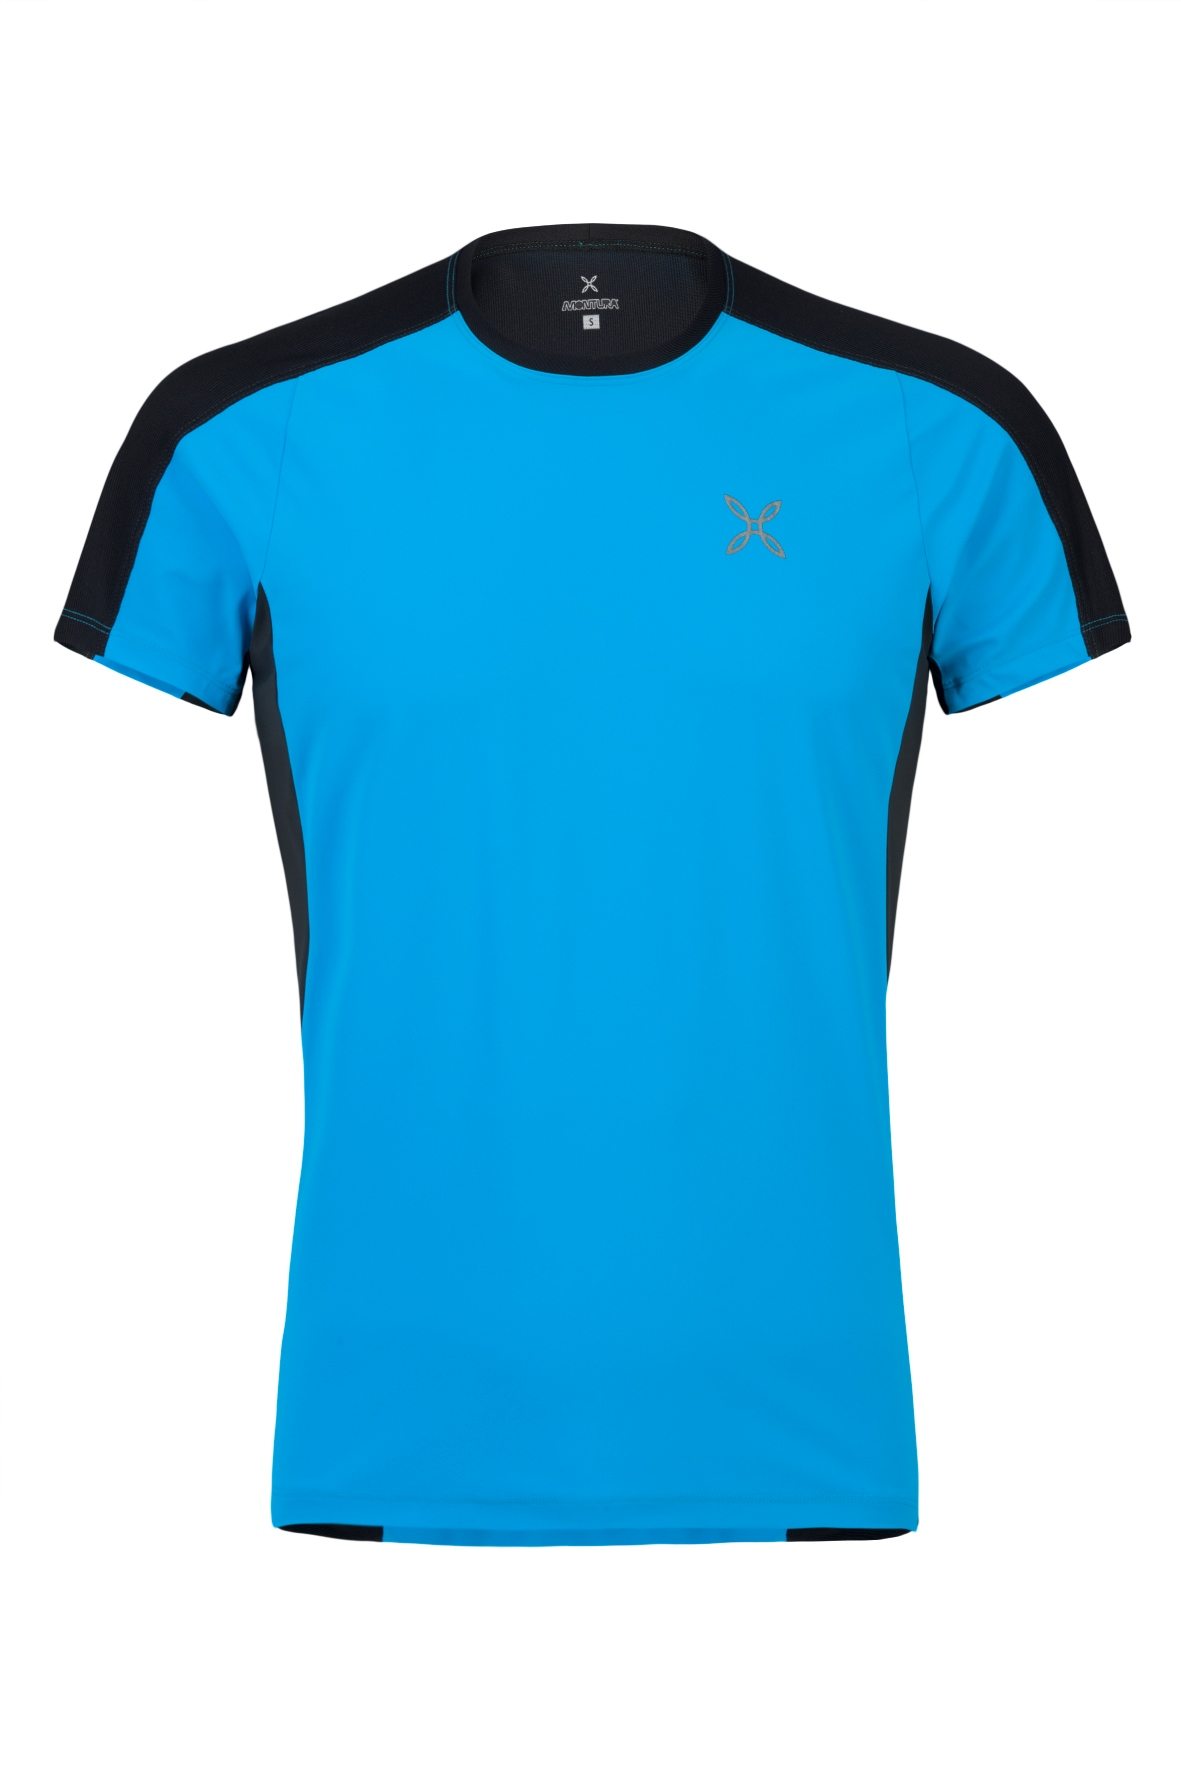 montura t shirt uomo  MONTURA ACTIVITY T-SHIRT - Euro 63,00 - t-shirt/camicie - Passsport ...